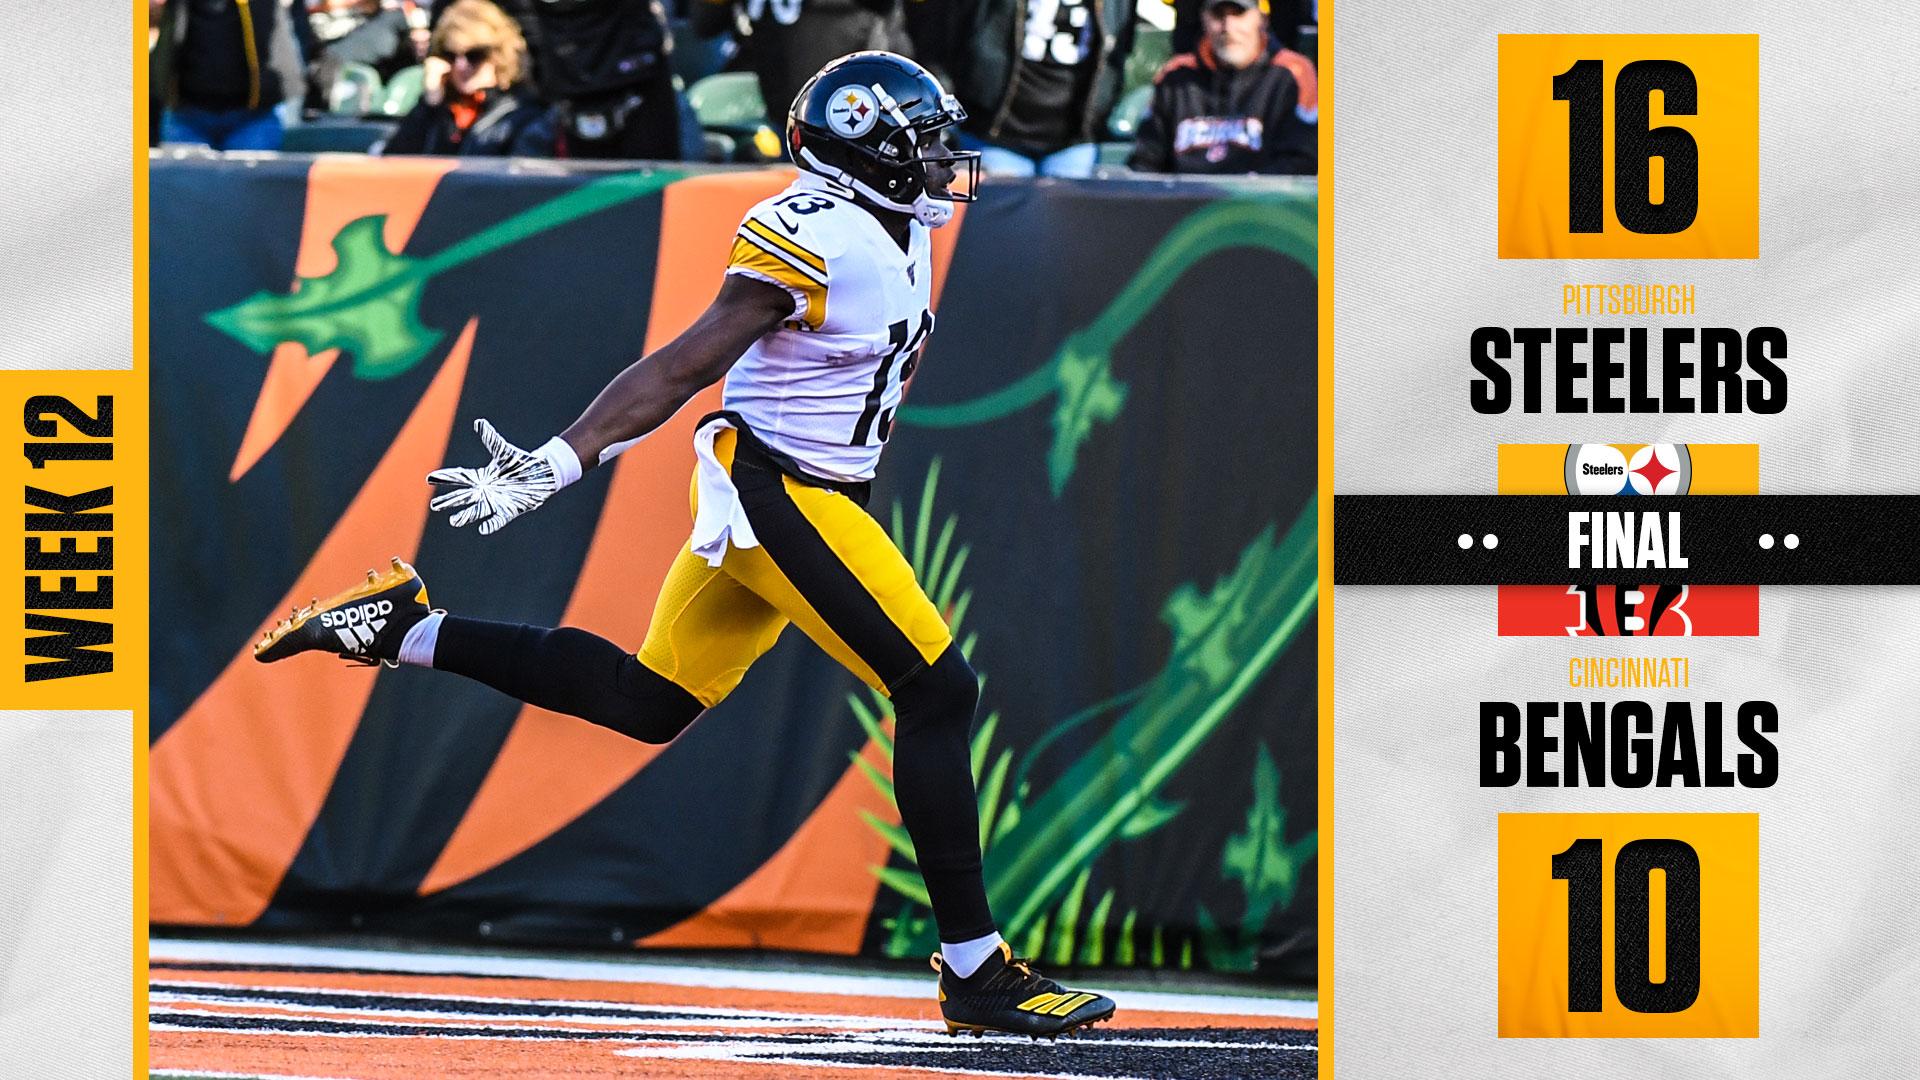 Pittsburgh Steelers On Twitter A Win In Cincinnati